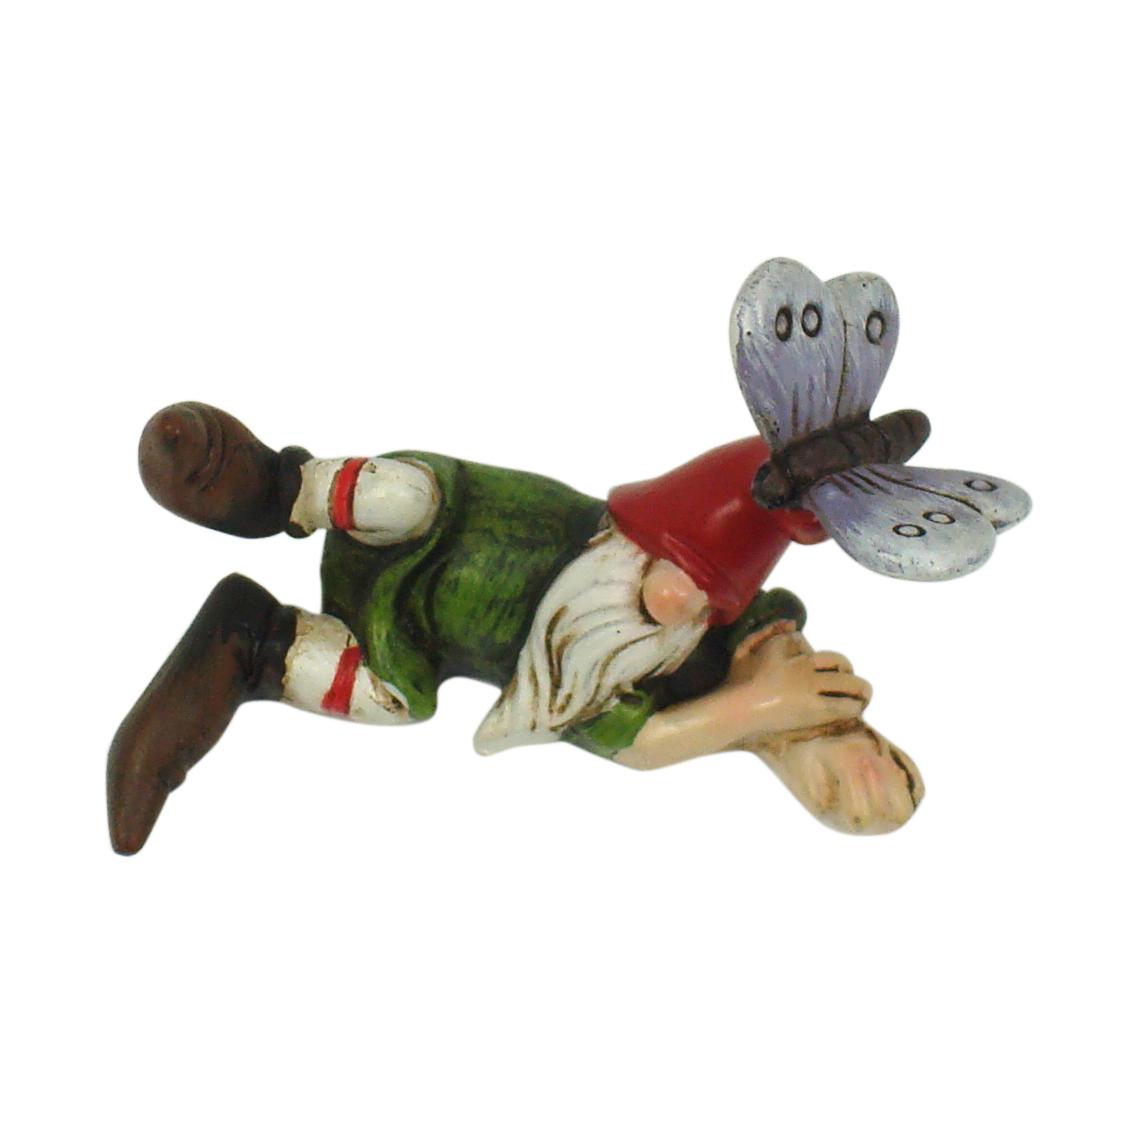 Garden Gnome 5.5cm - Restock ETA 5/9/17